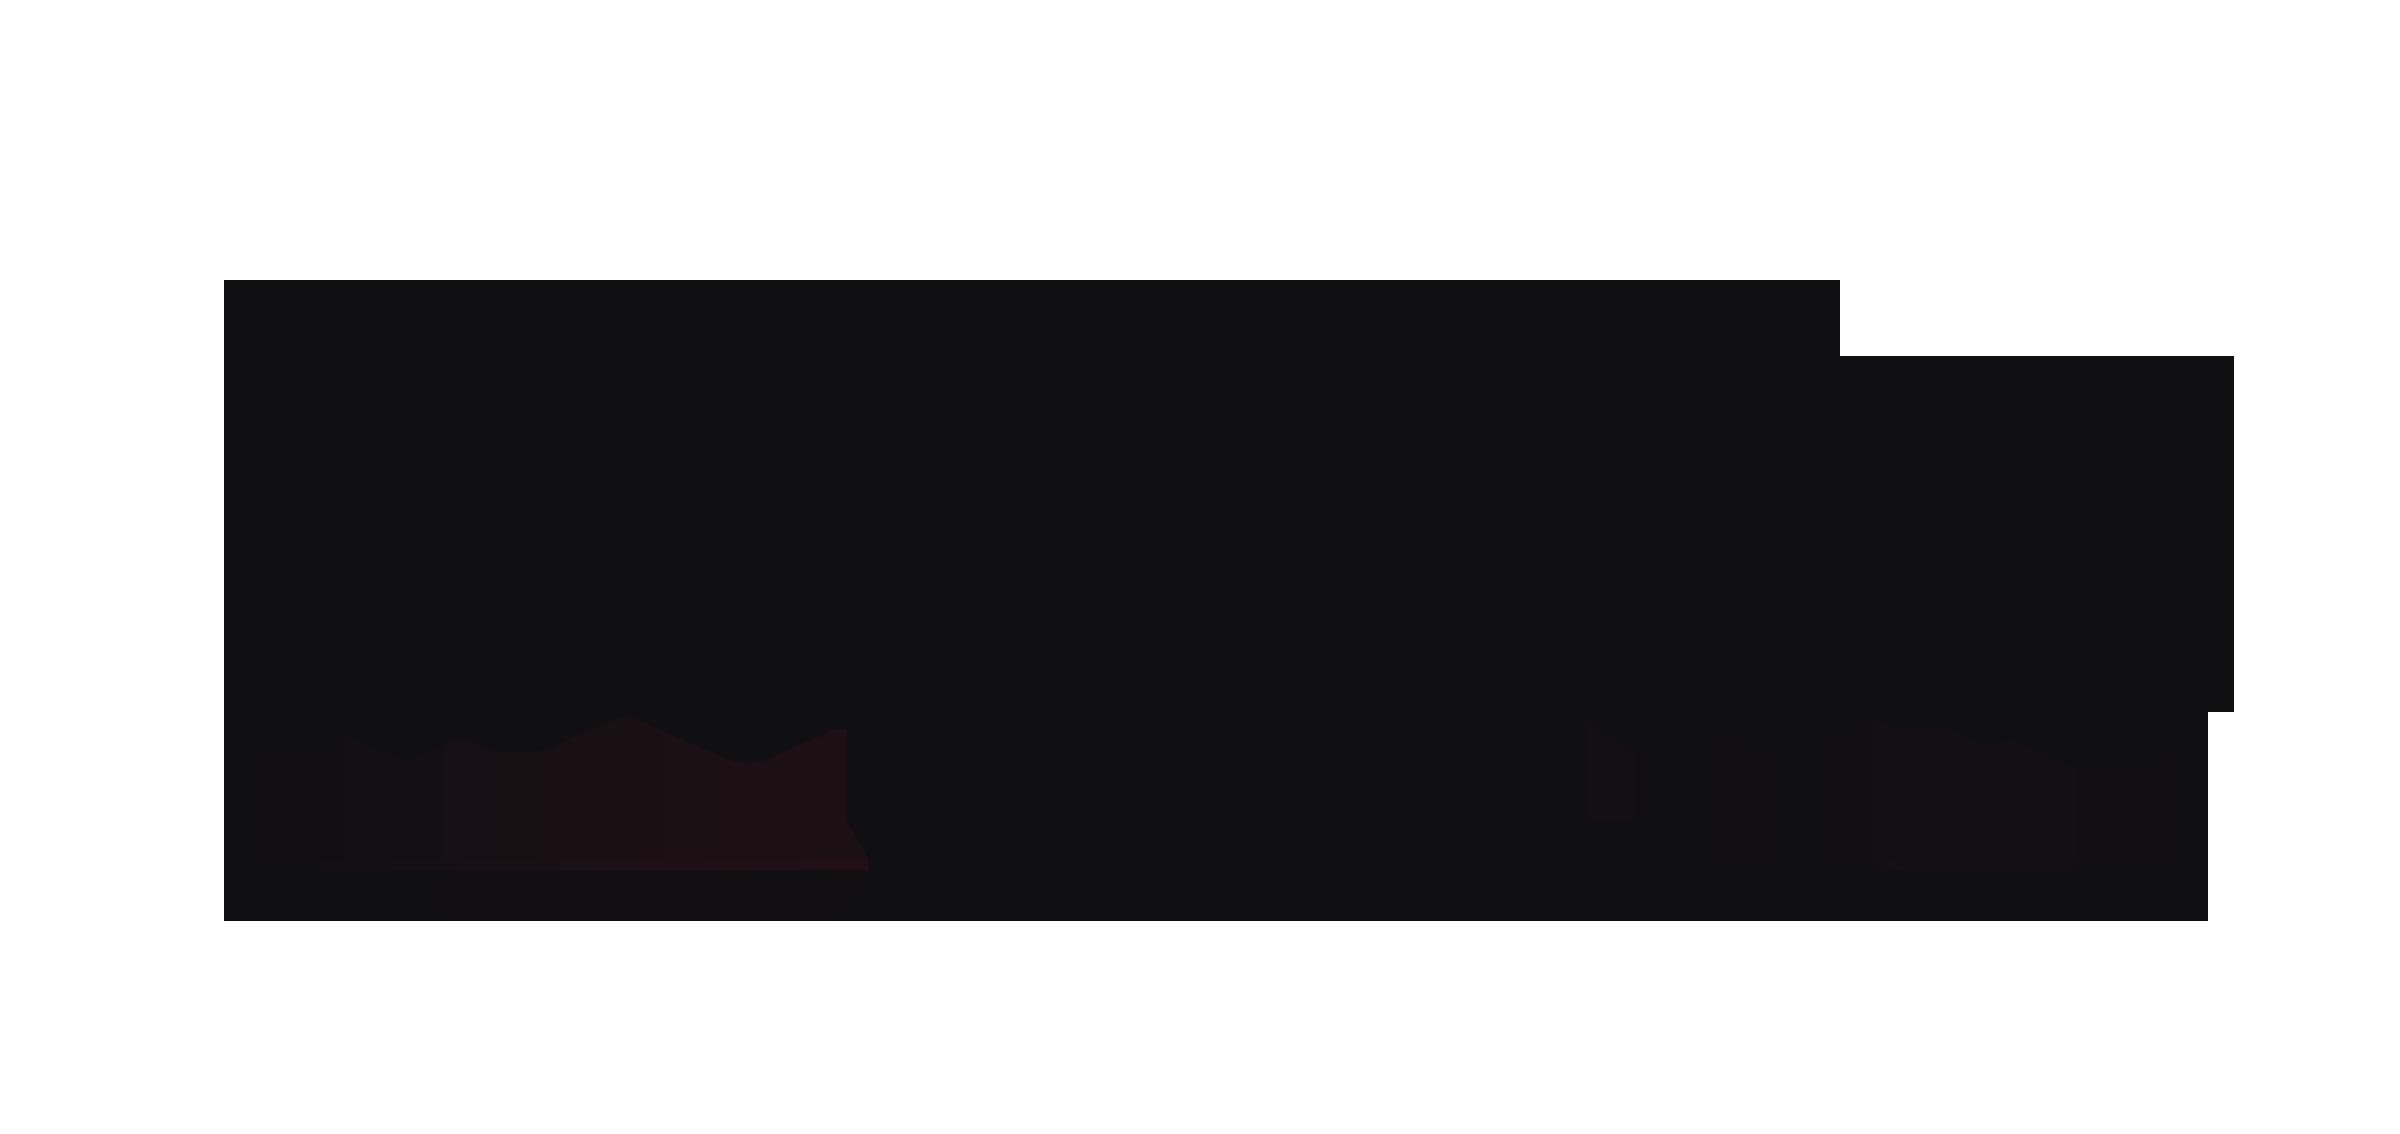 Winny Rivas